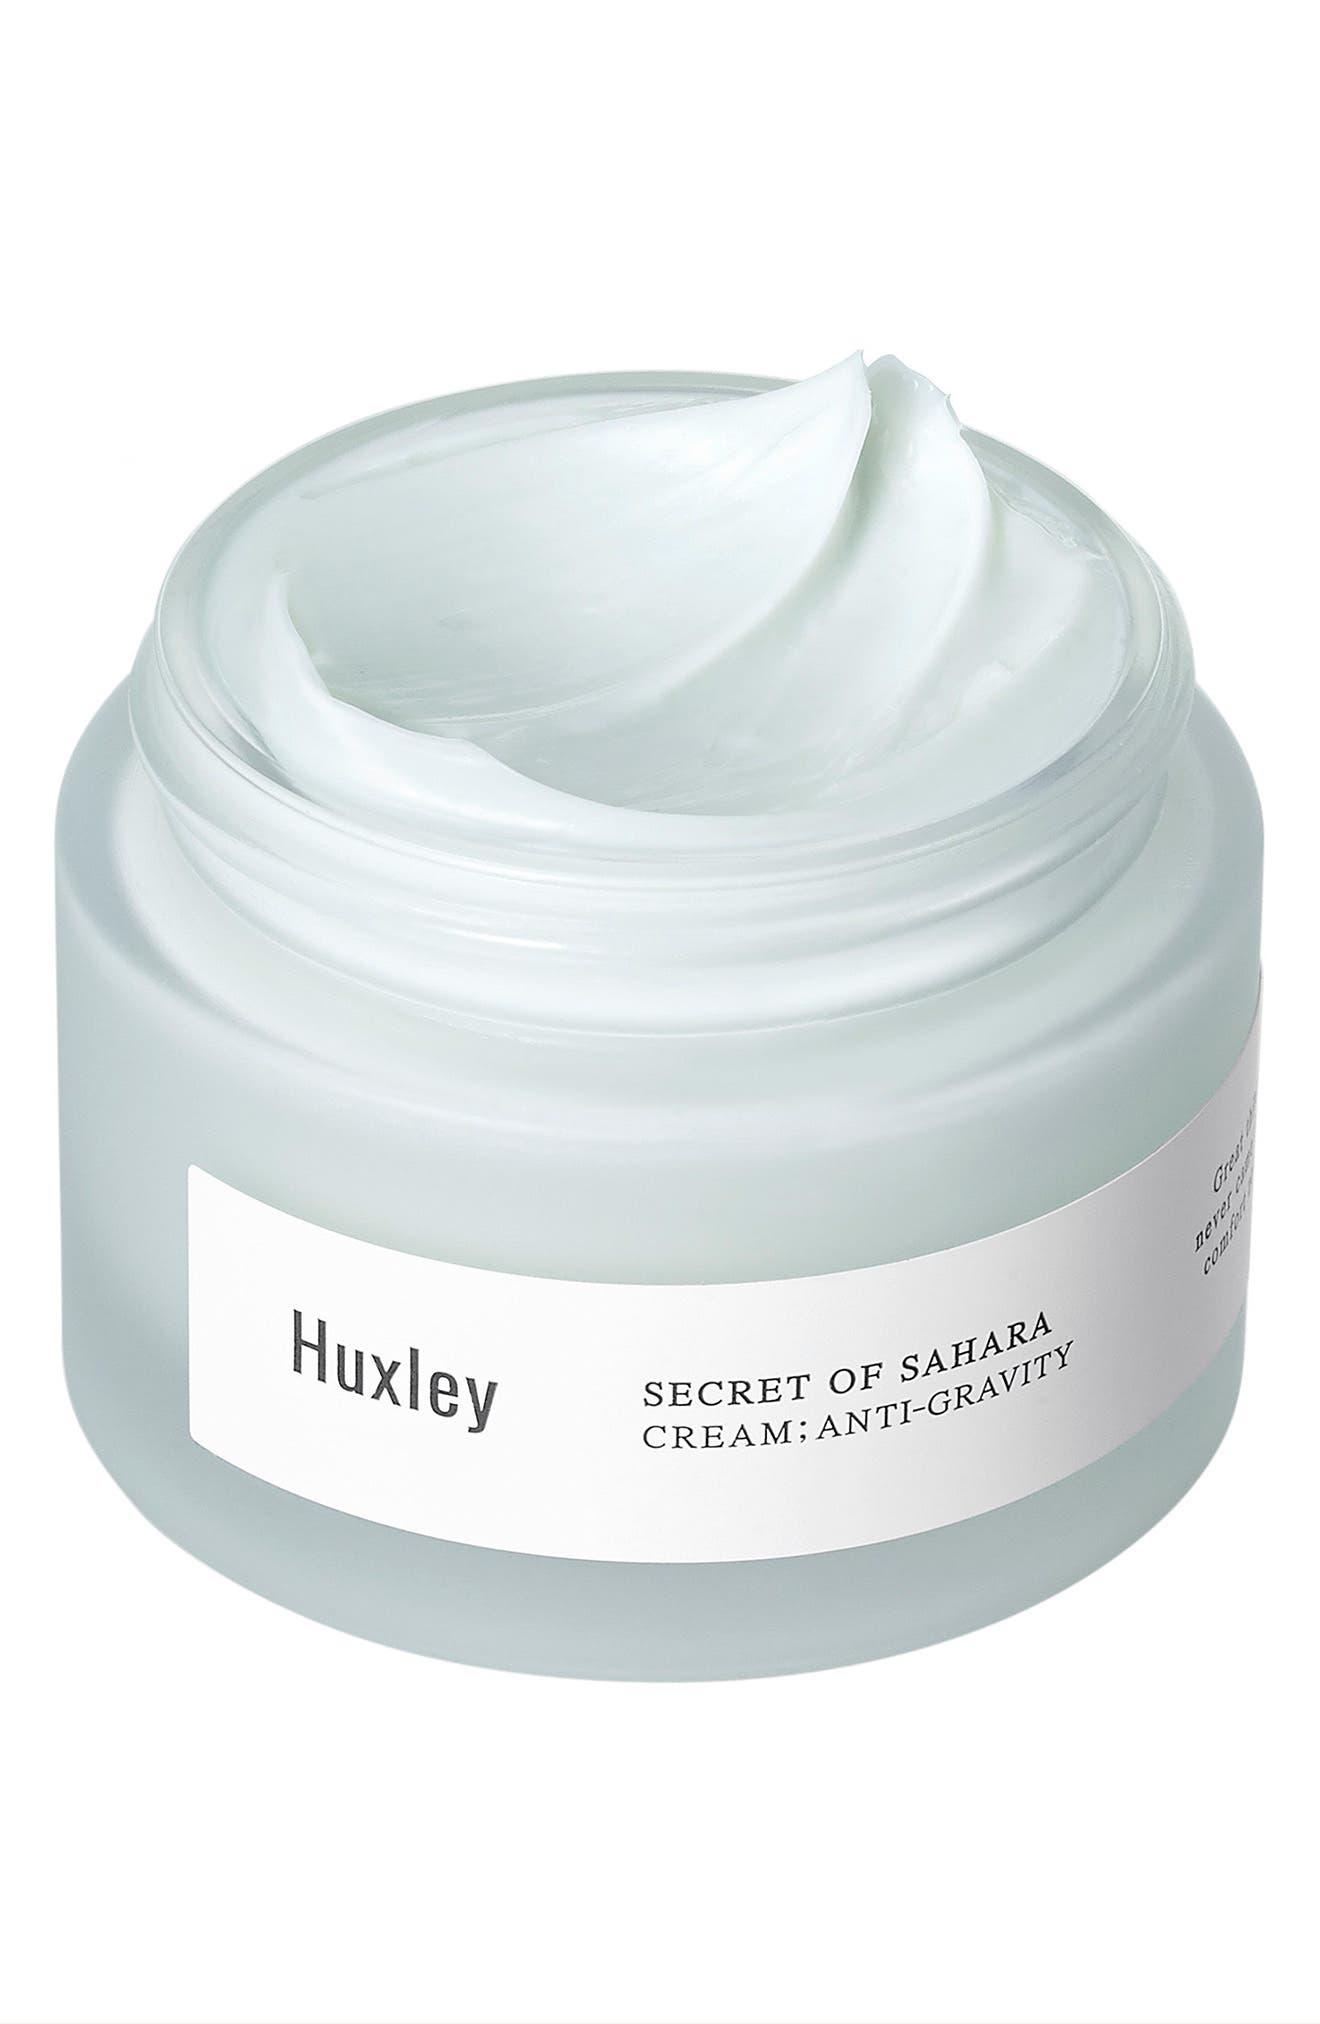 Secret of Sahara - Anti-Gravity Cream,                             Alternate thumbnail 3, color,                             000